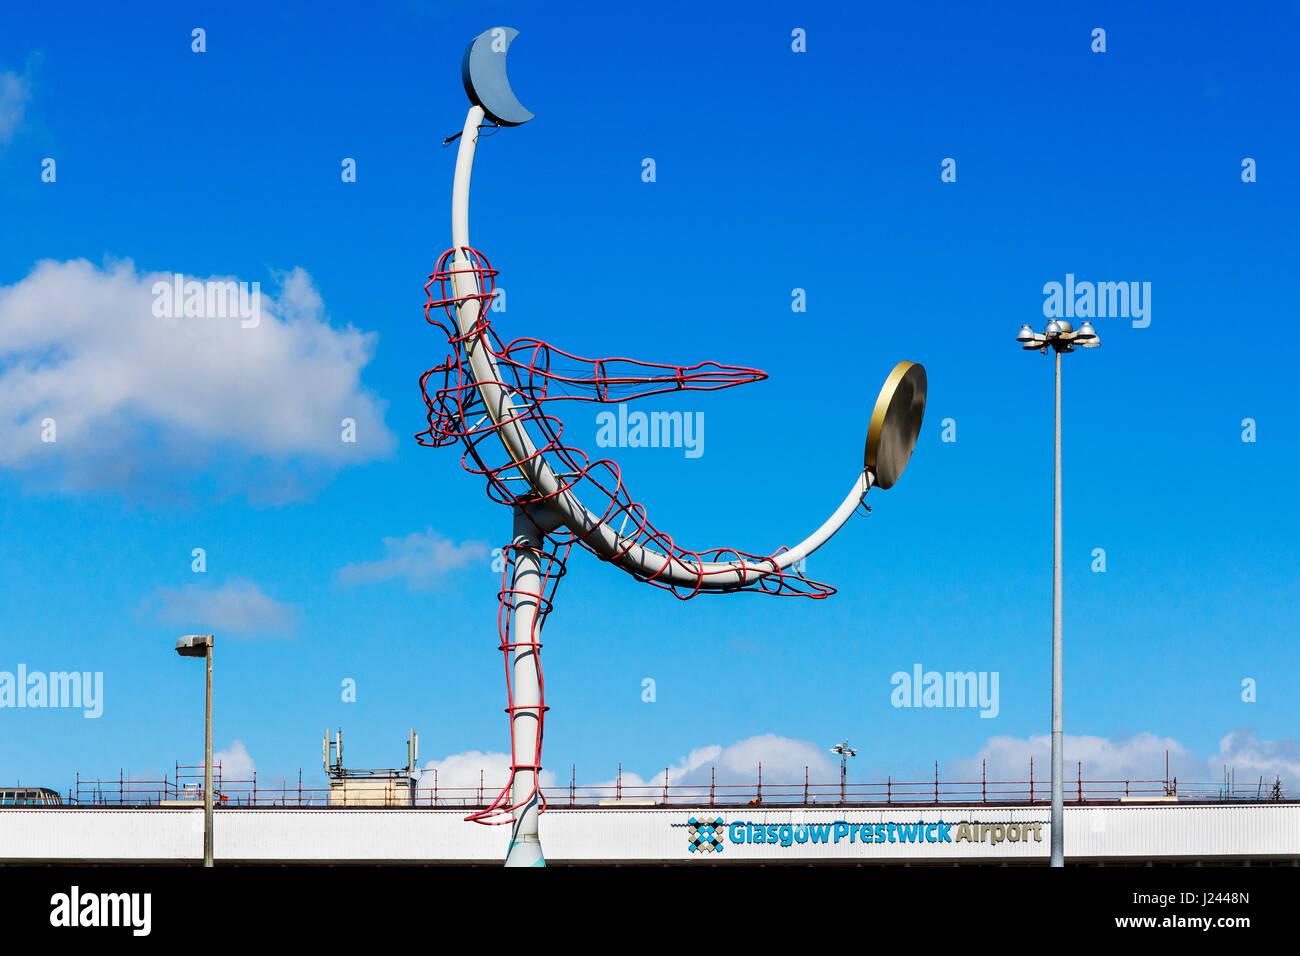 Flying man symbol outside Glasgow Prestwick Airport, Prestwick, Ayrshire, Scotland, UK Stock Photo